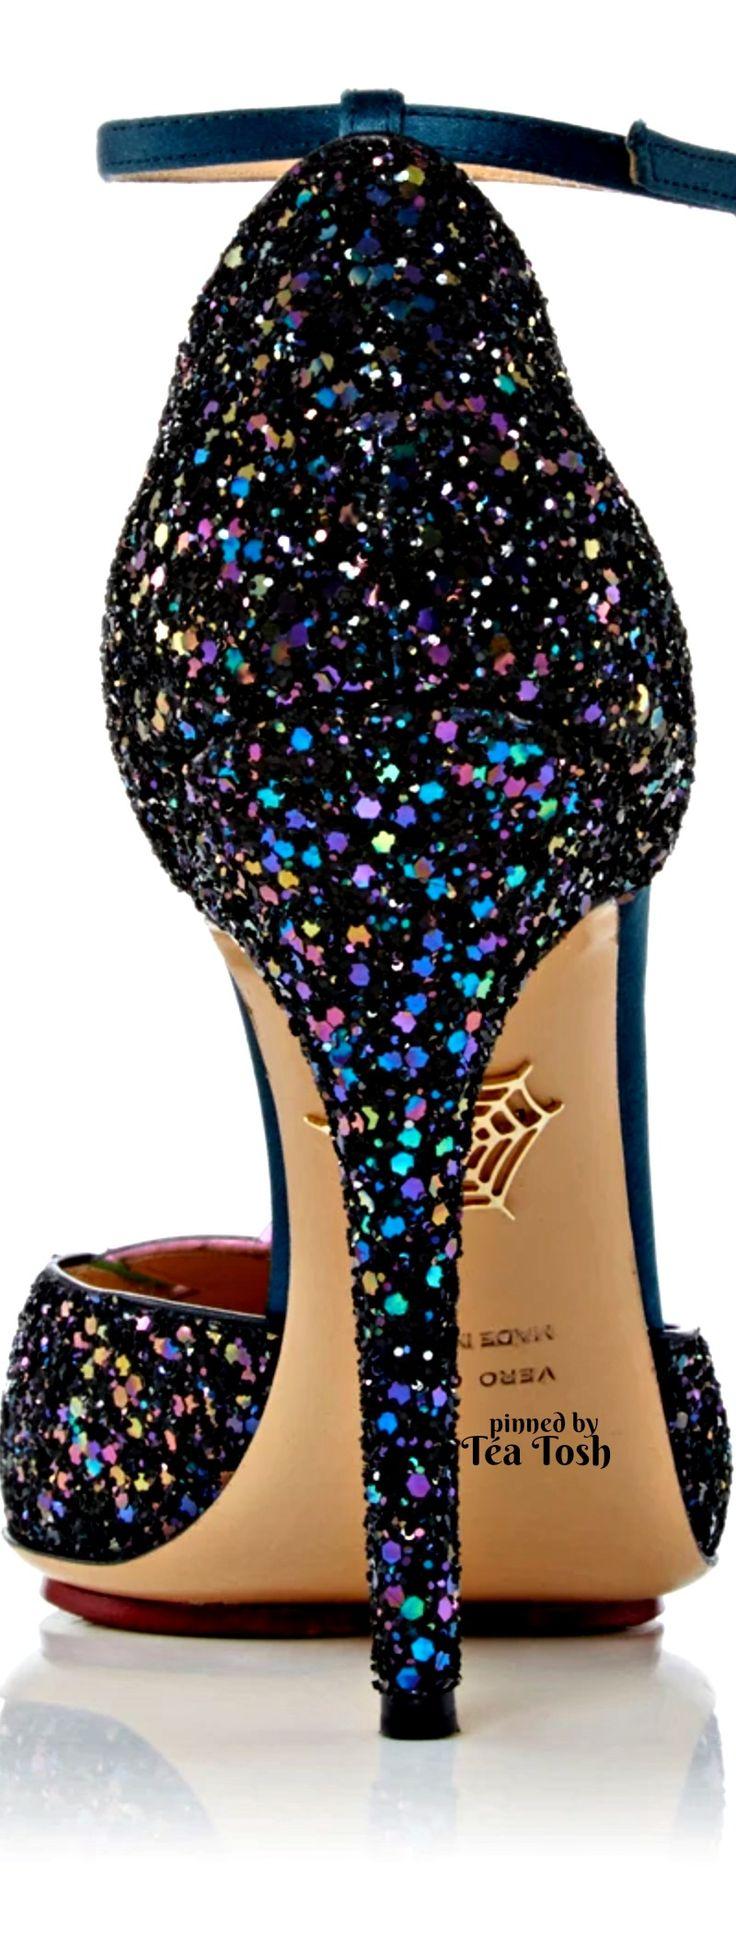 ❇Téa Tosh❇ Charlotte Olympia, Twilight Princess Heel